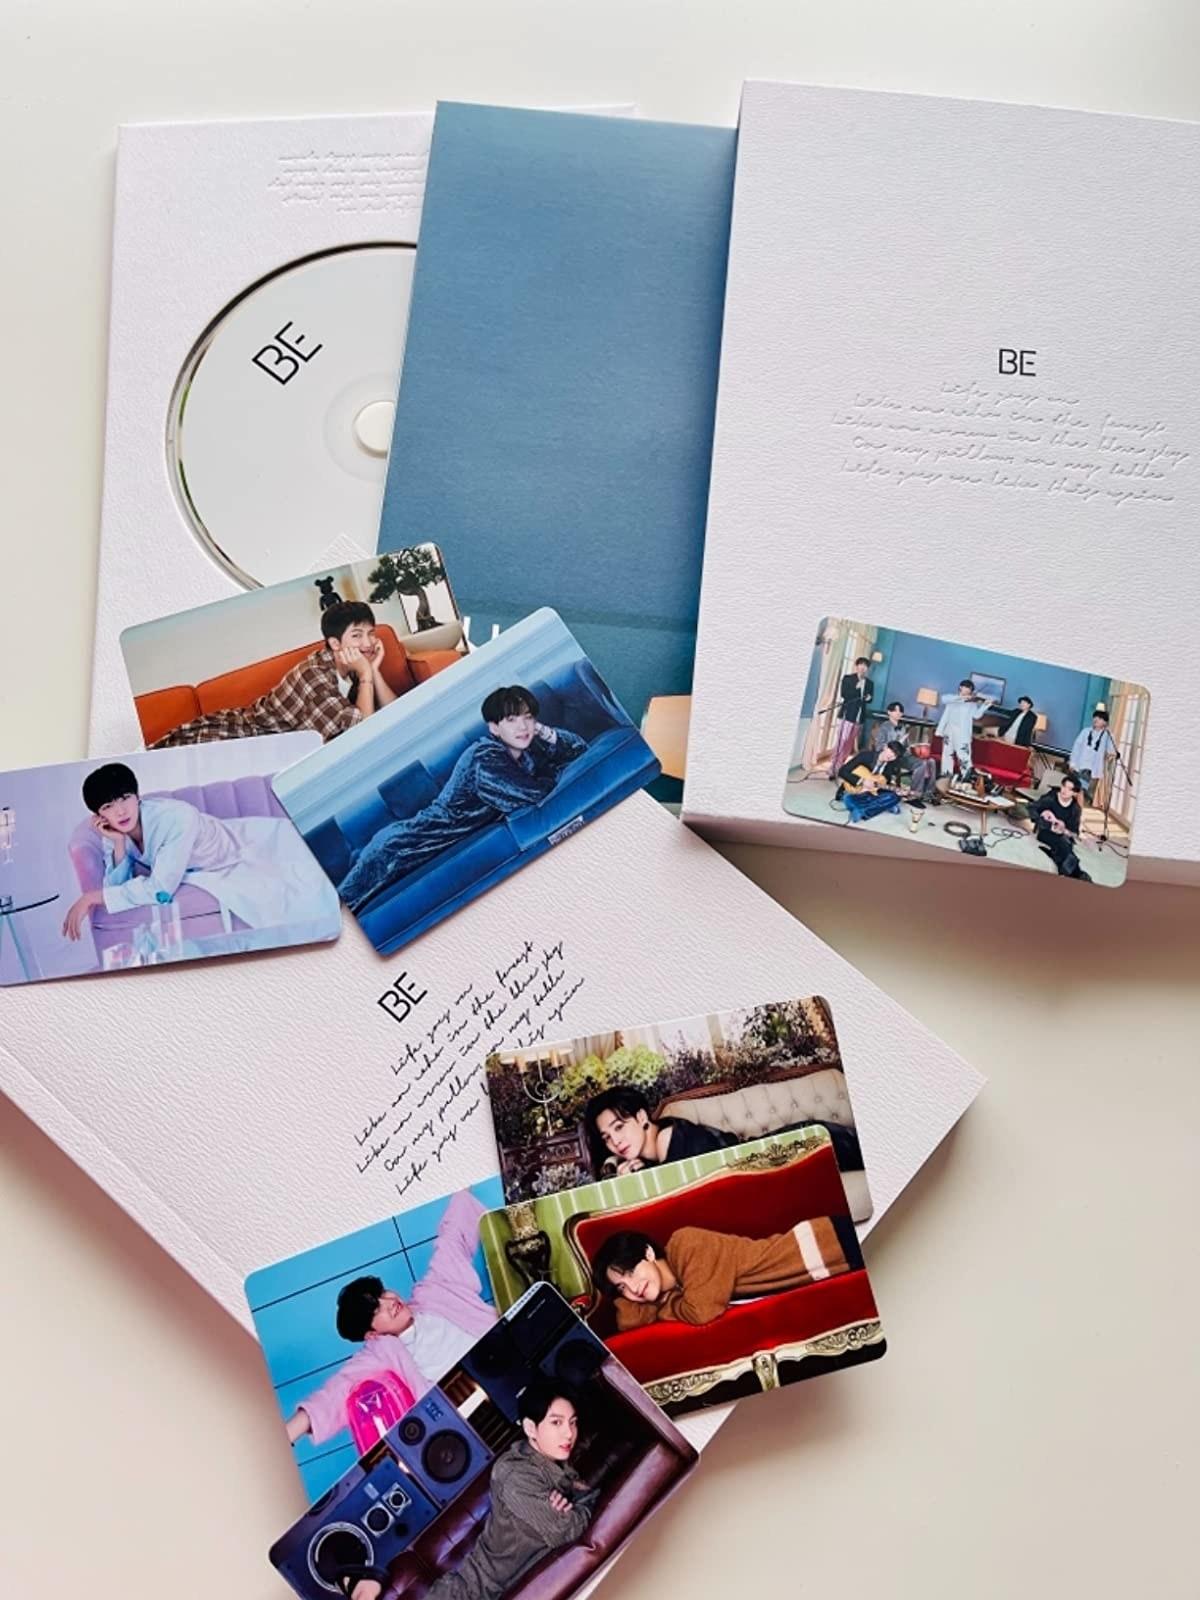 BTS' BE album with goodies around it